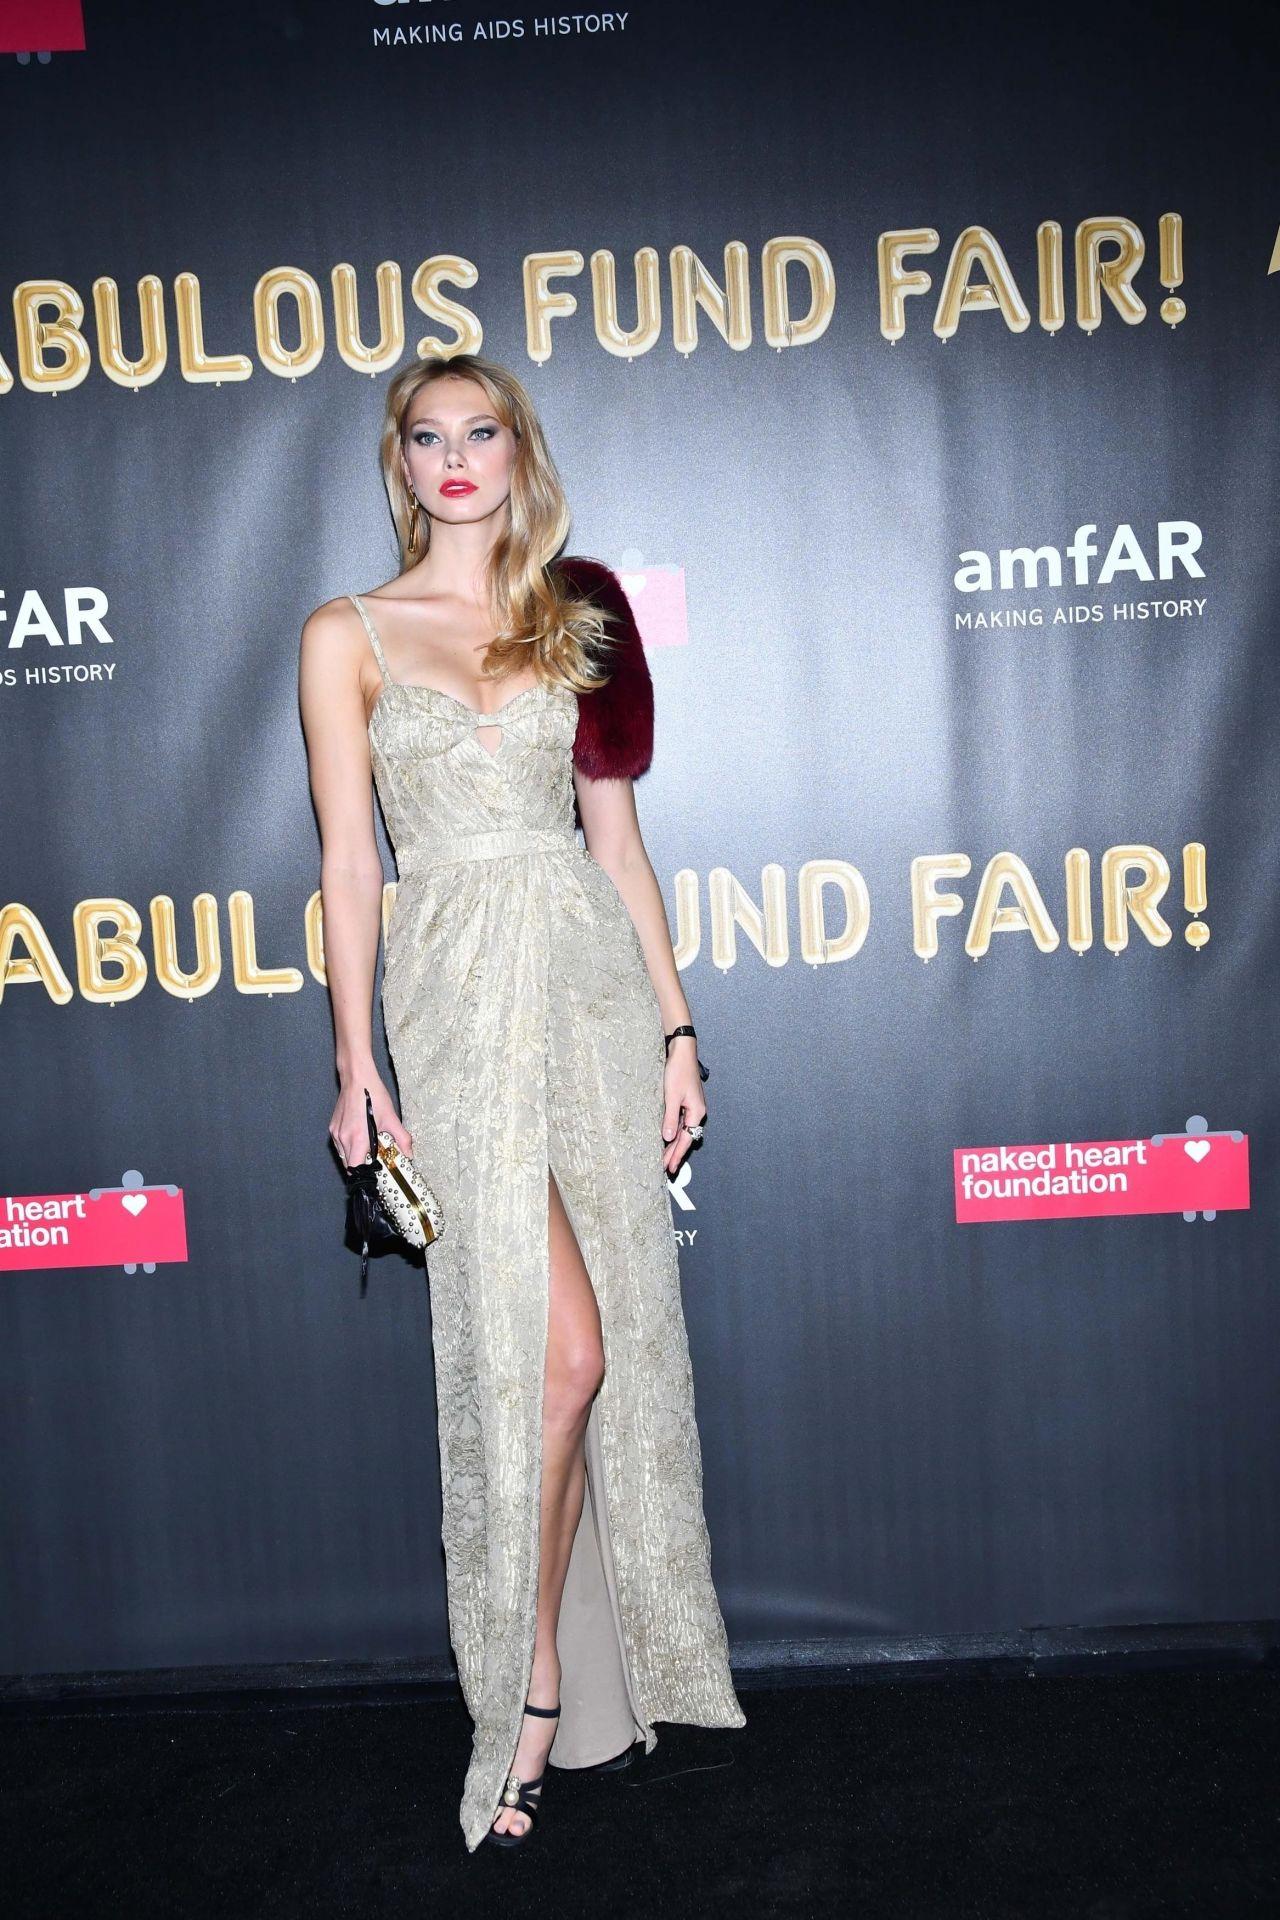 Nadine Leopold – 2017 amfAR Fabulous Fund Fair in NYC